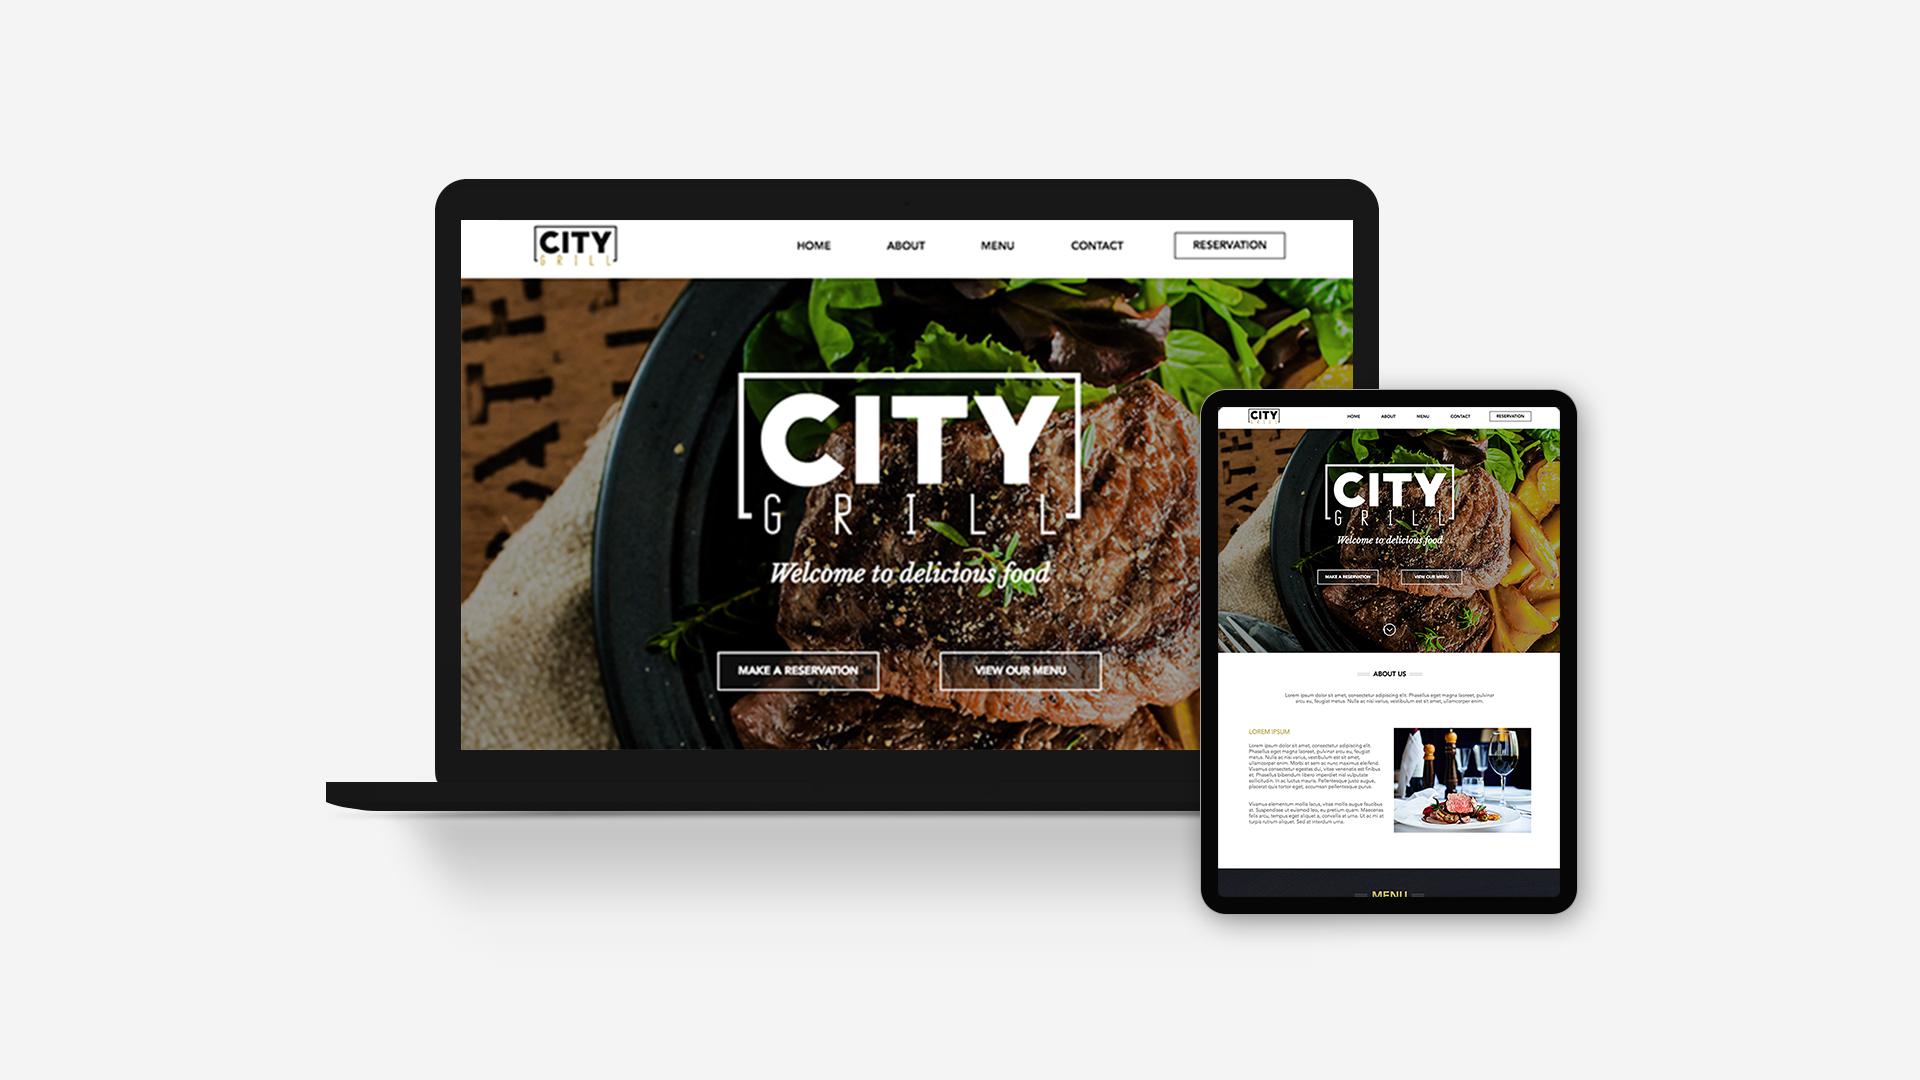 City Grill